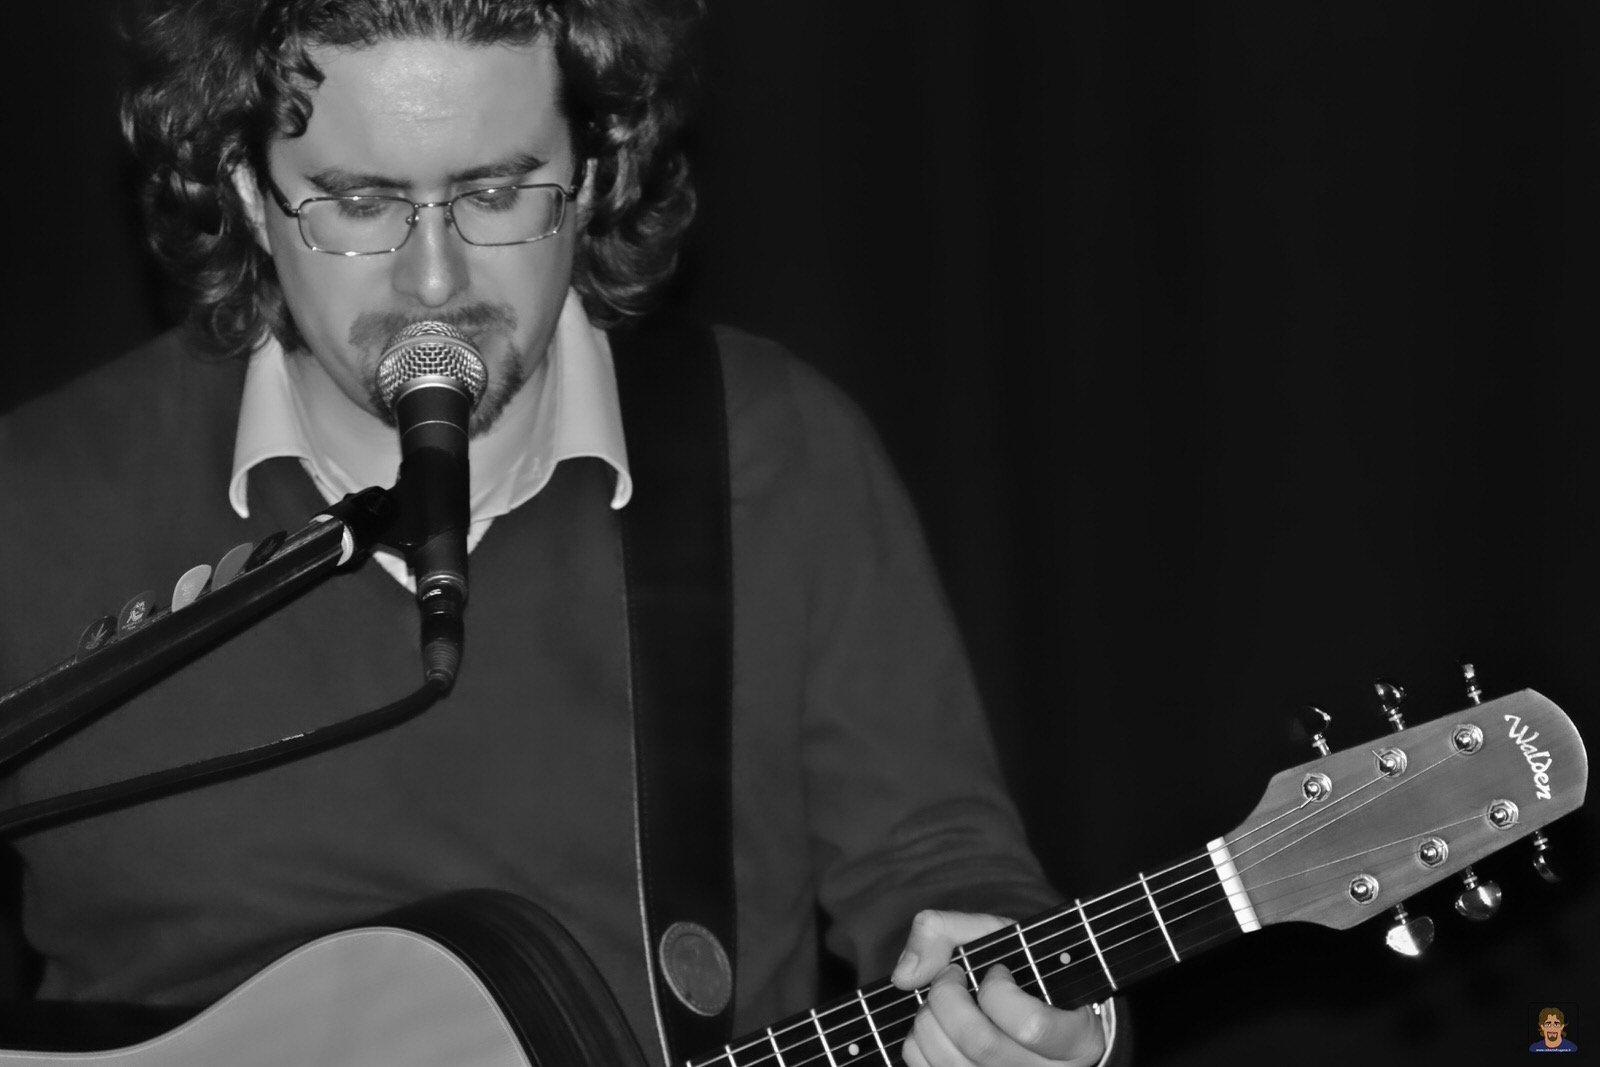 Roberto Frugone cantautore live concerto acustico Padova 02